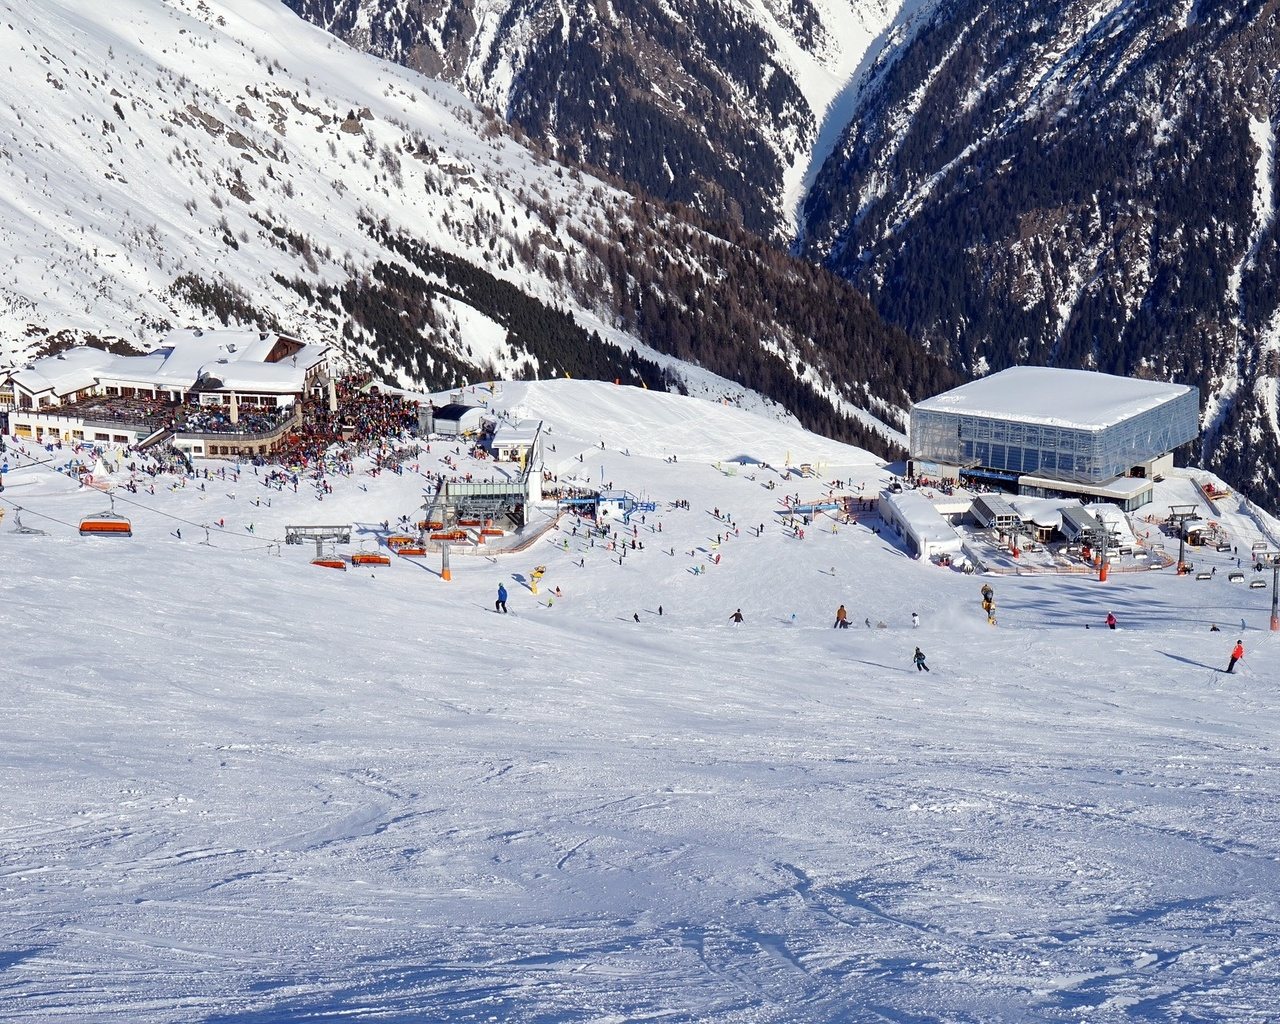 горы, курорт, горнолыжный, панорама